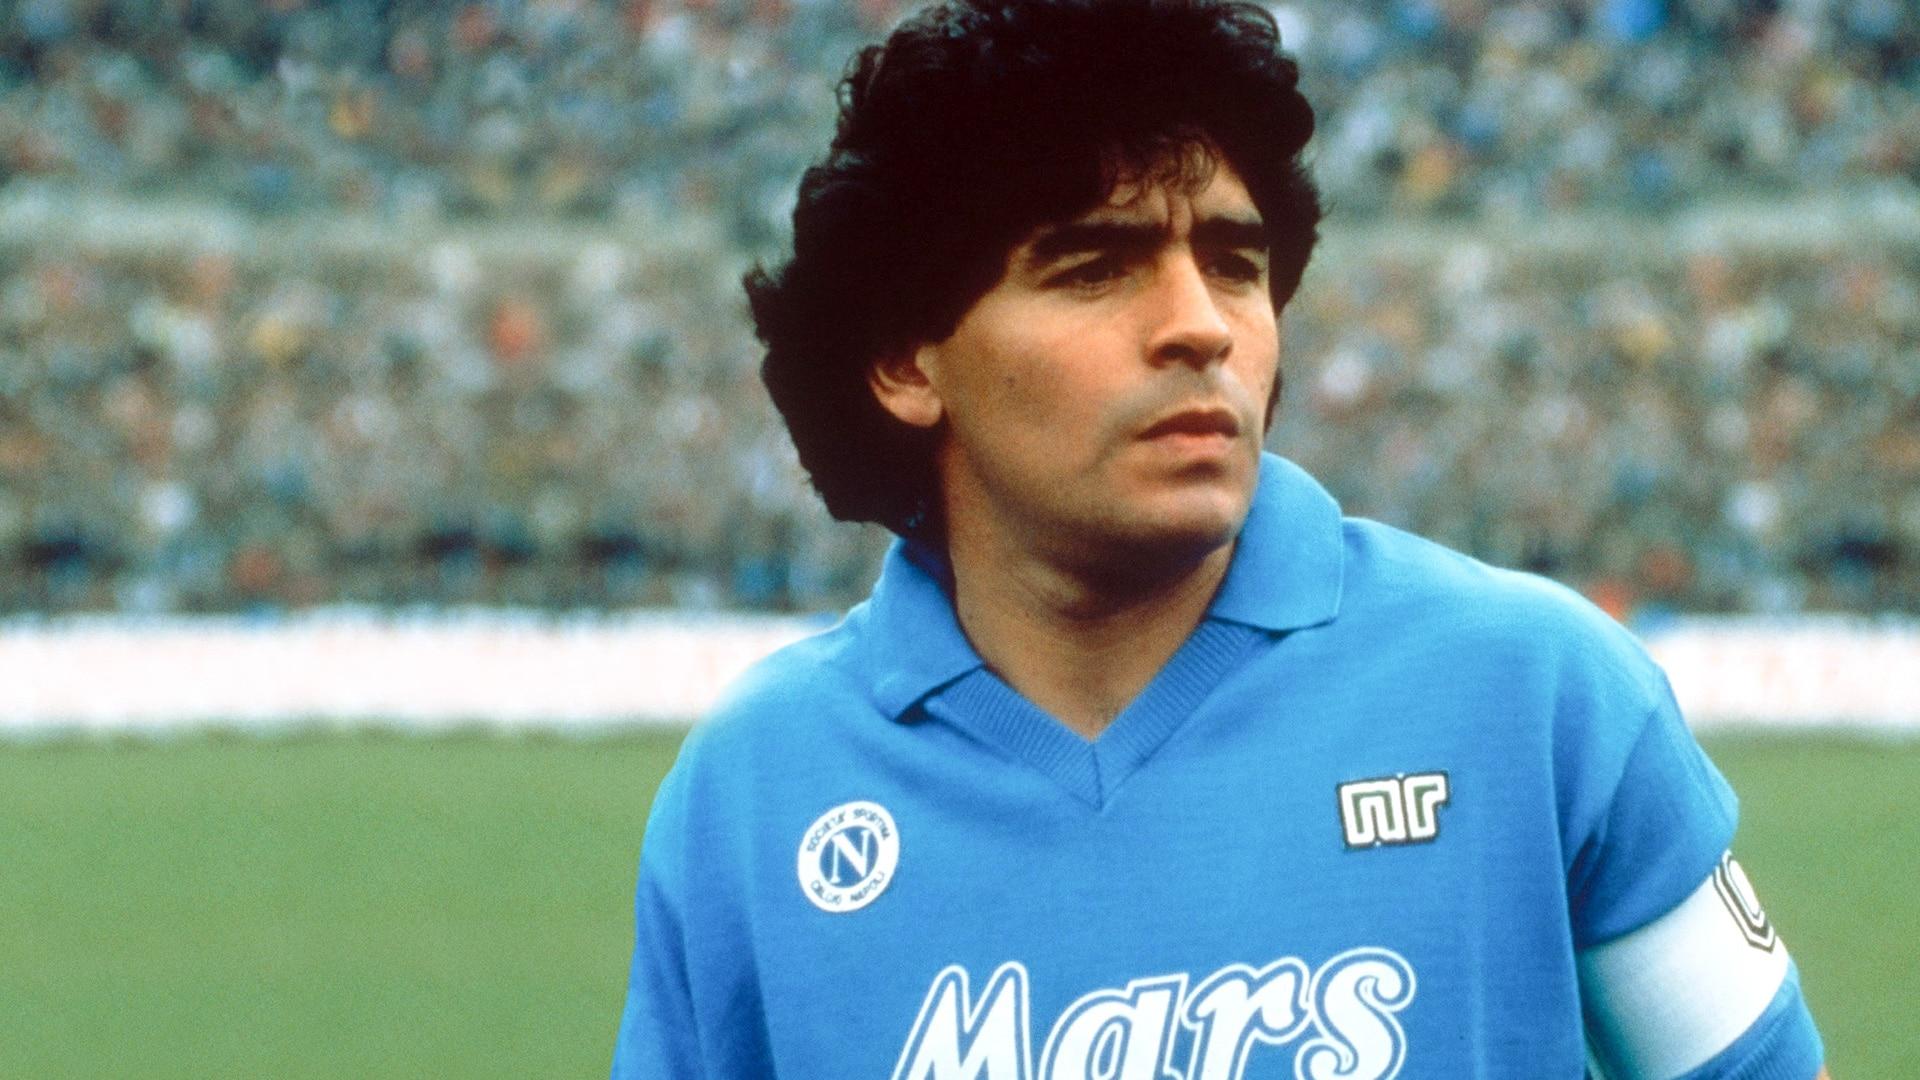 Diego Maradona - All 4